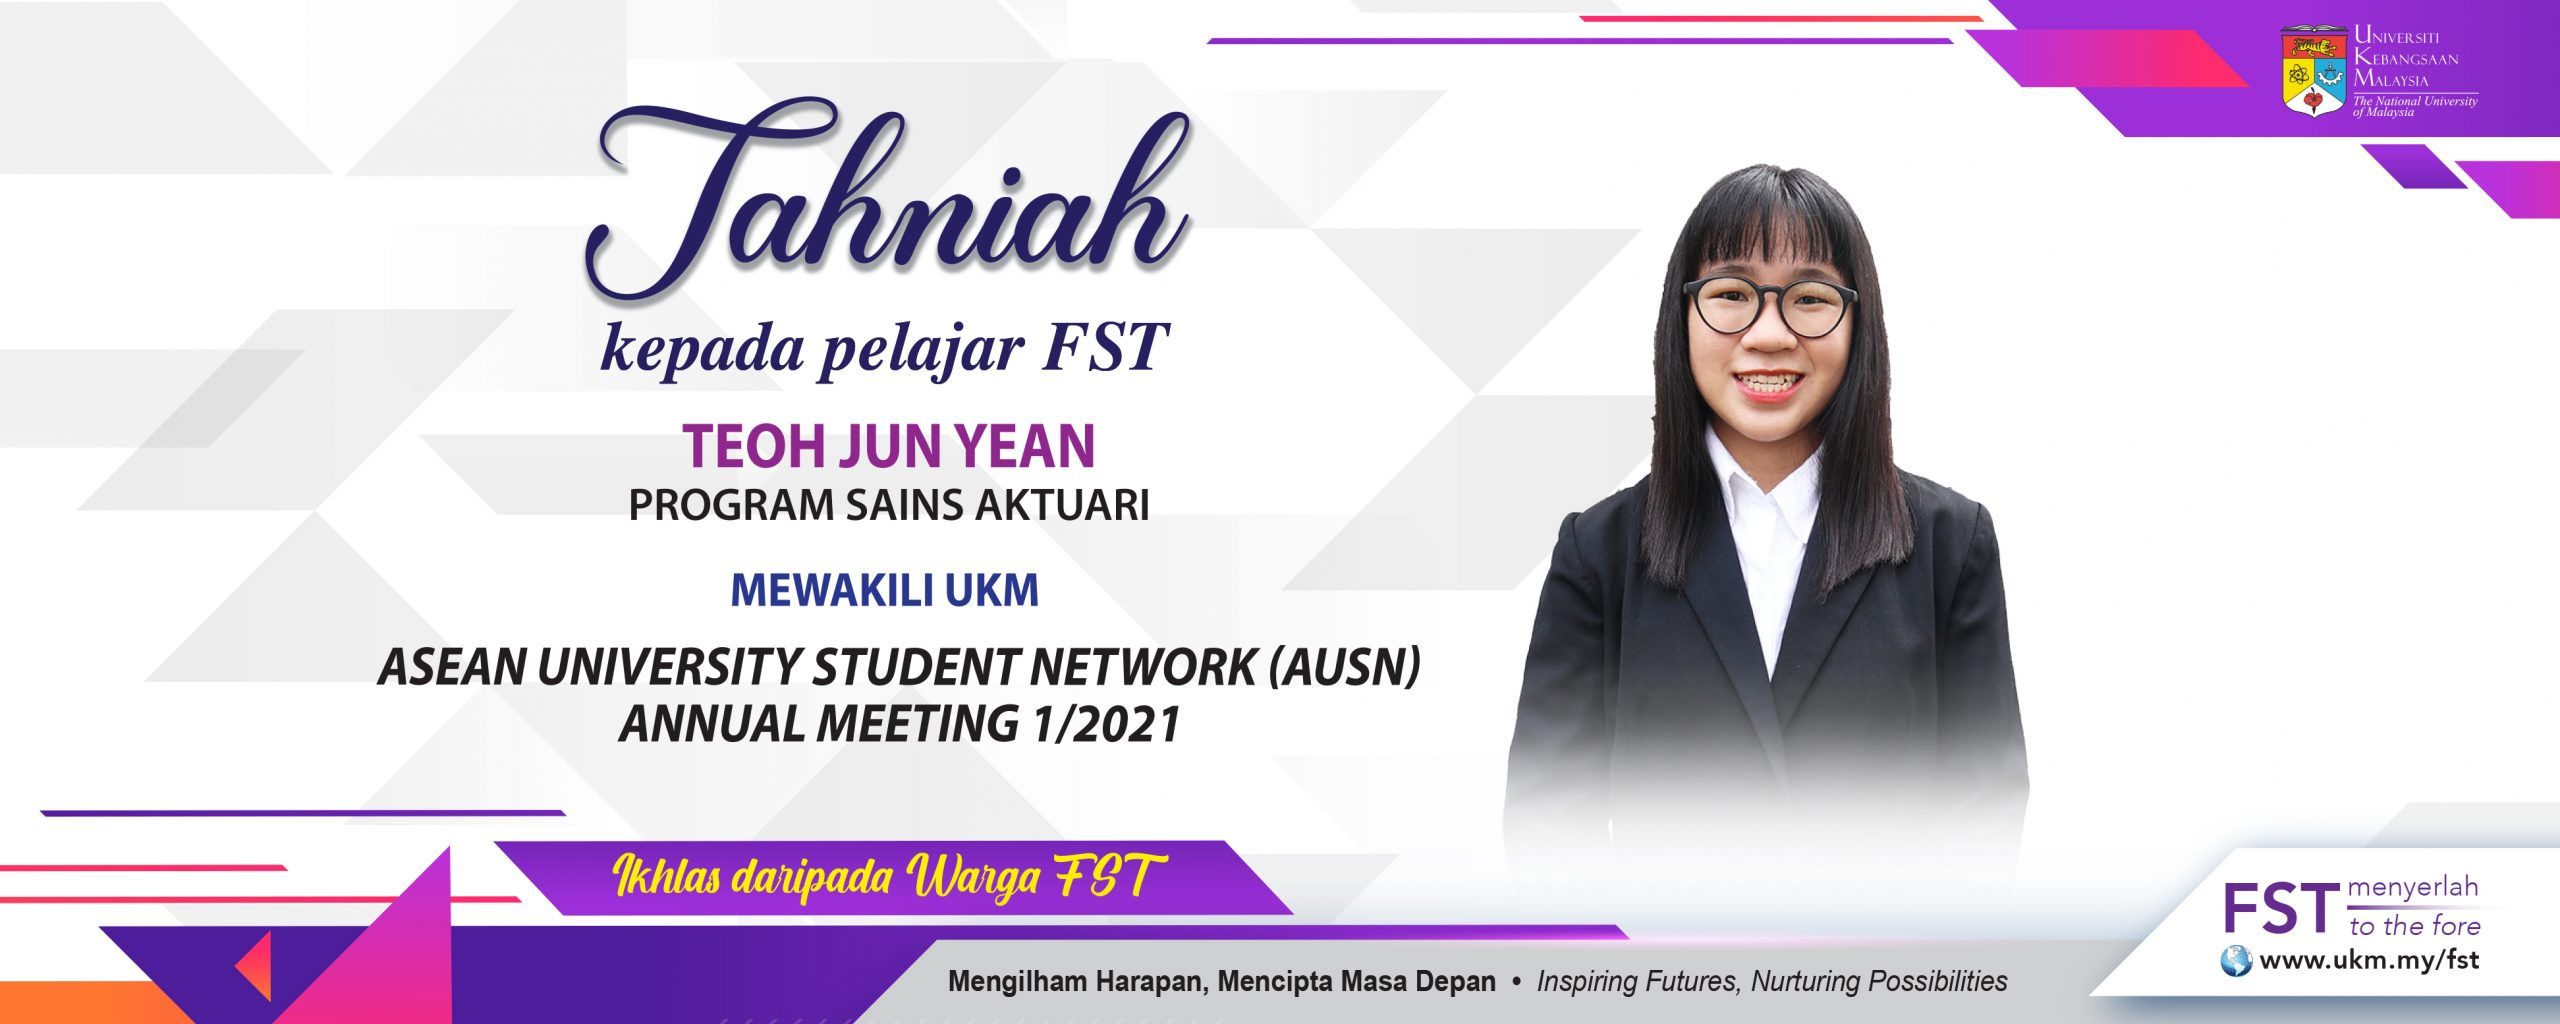 Tahniah Pelajar FST Mewakili UKM Asean University